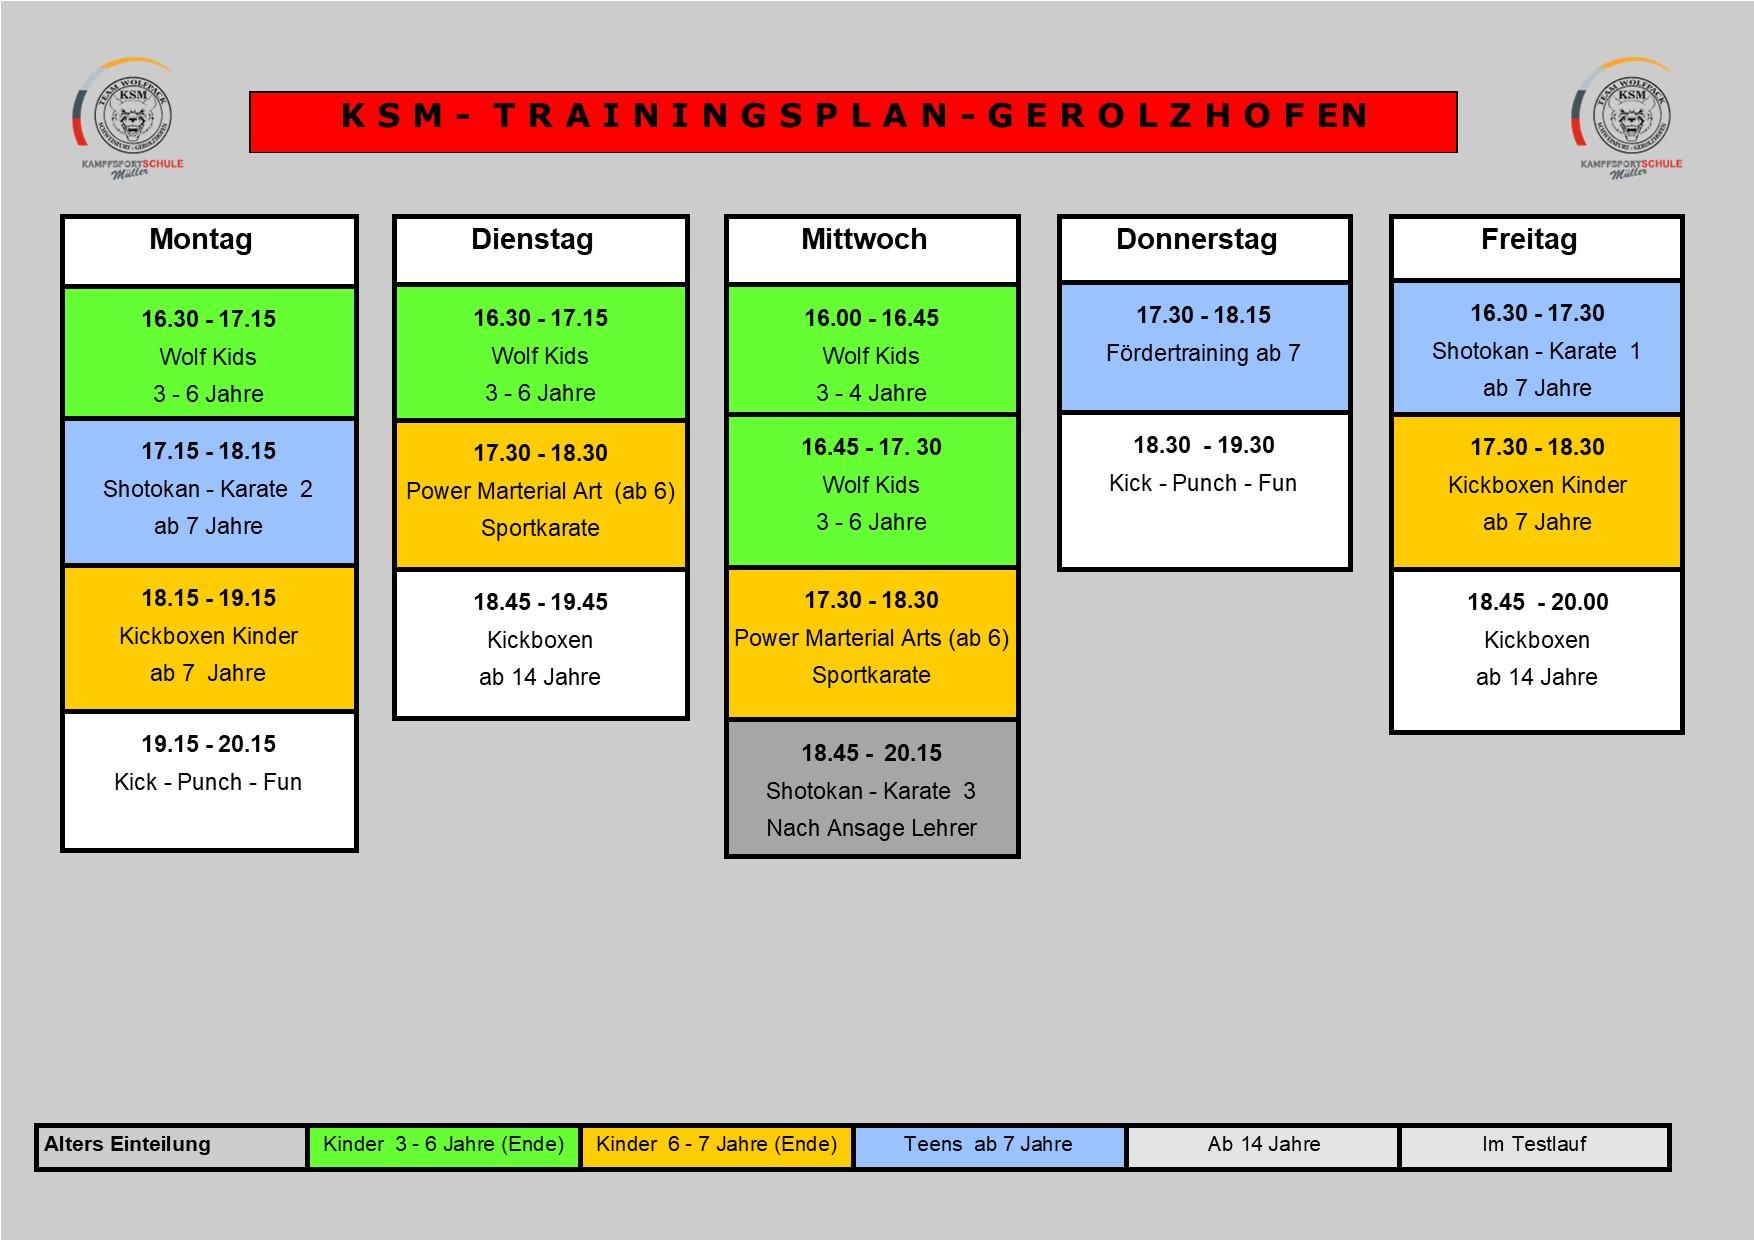 Trainingsplan Gerolzhofen